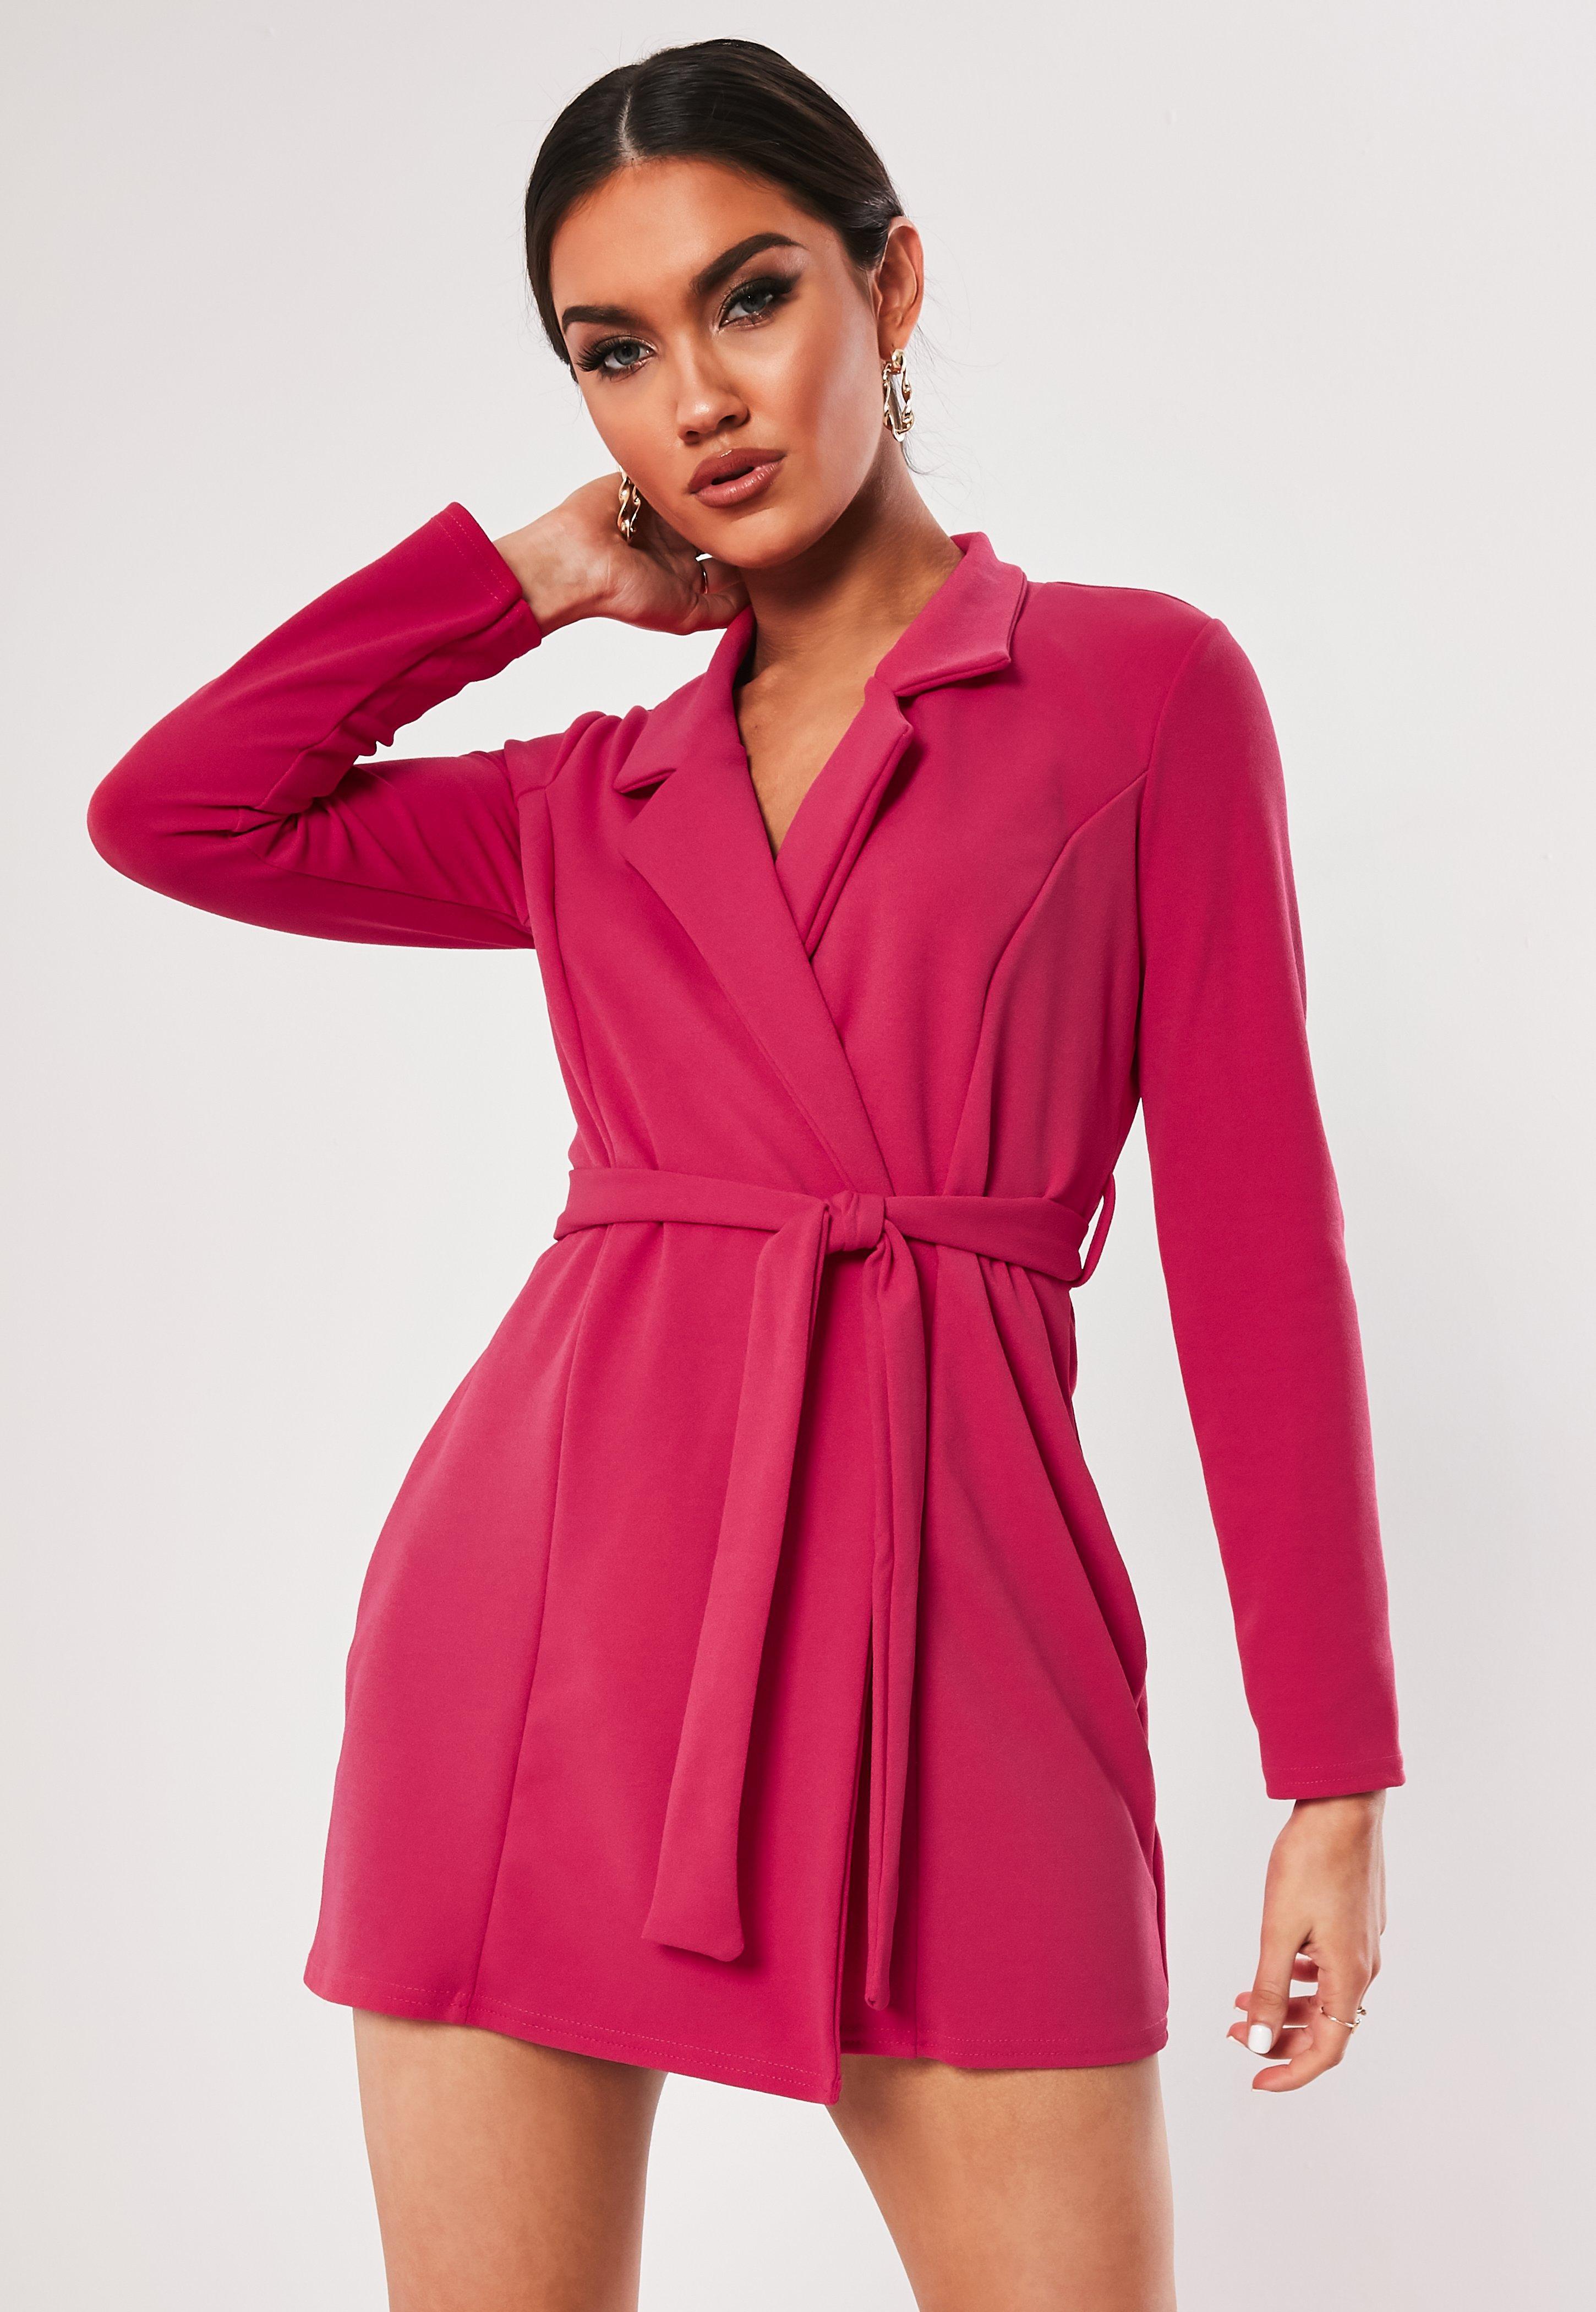 a8f922c71e2ee Blazer Dresses - Women s Tuxedo Dresses Online